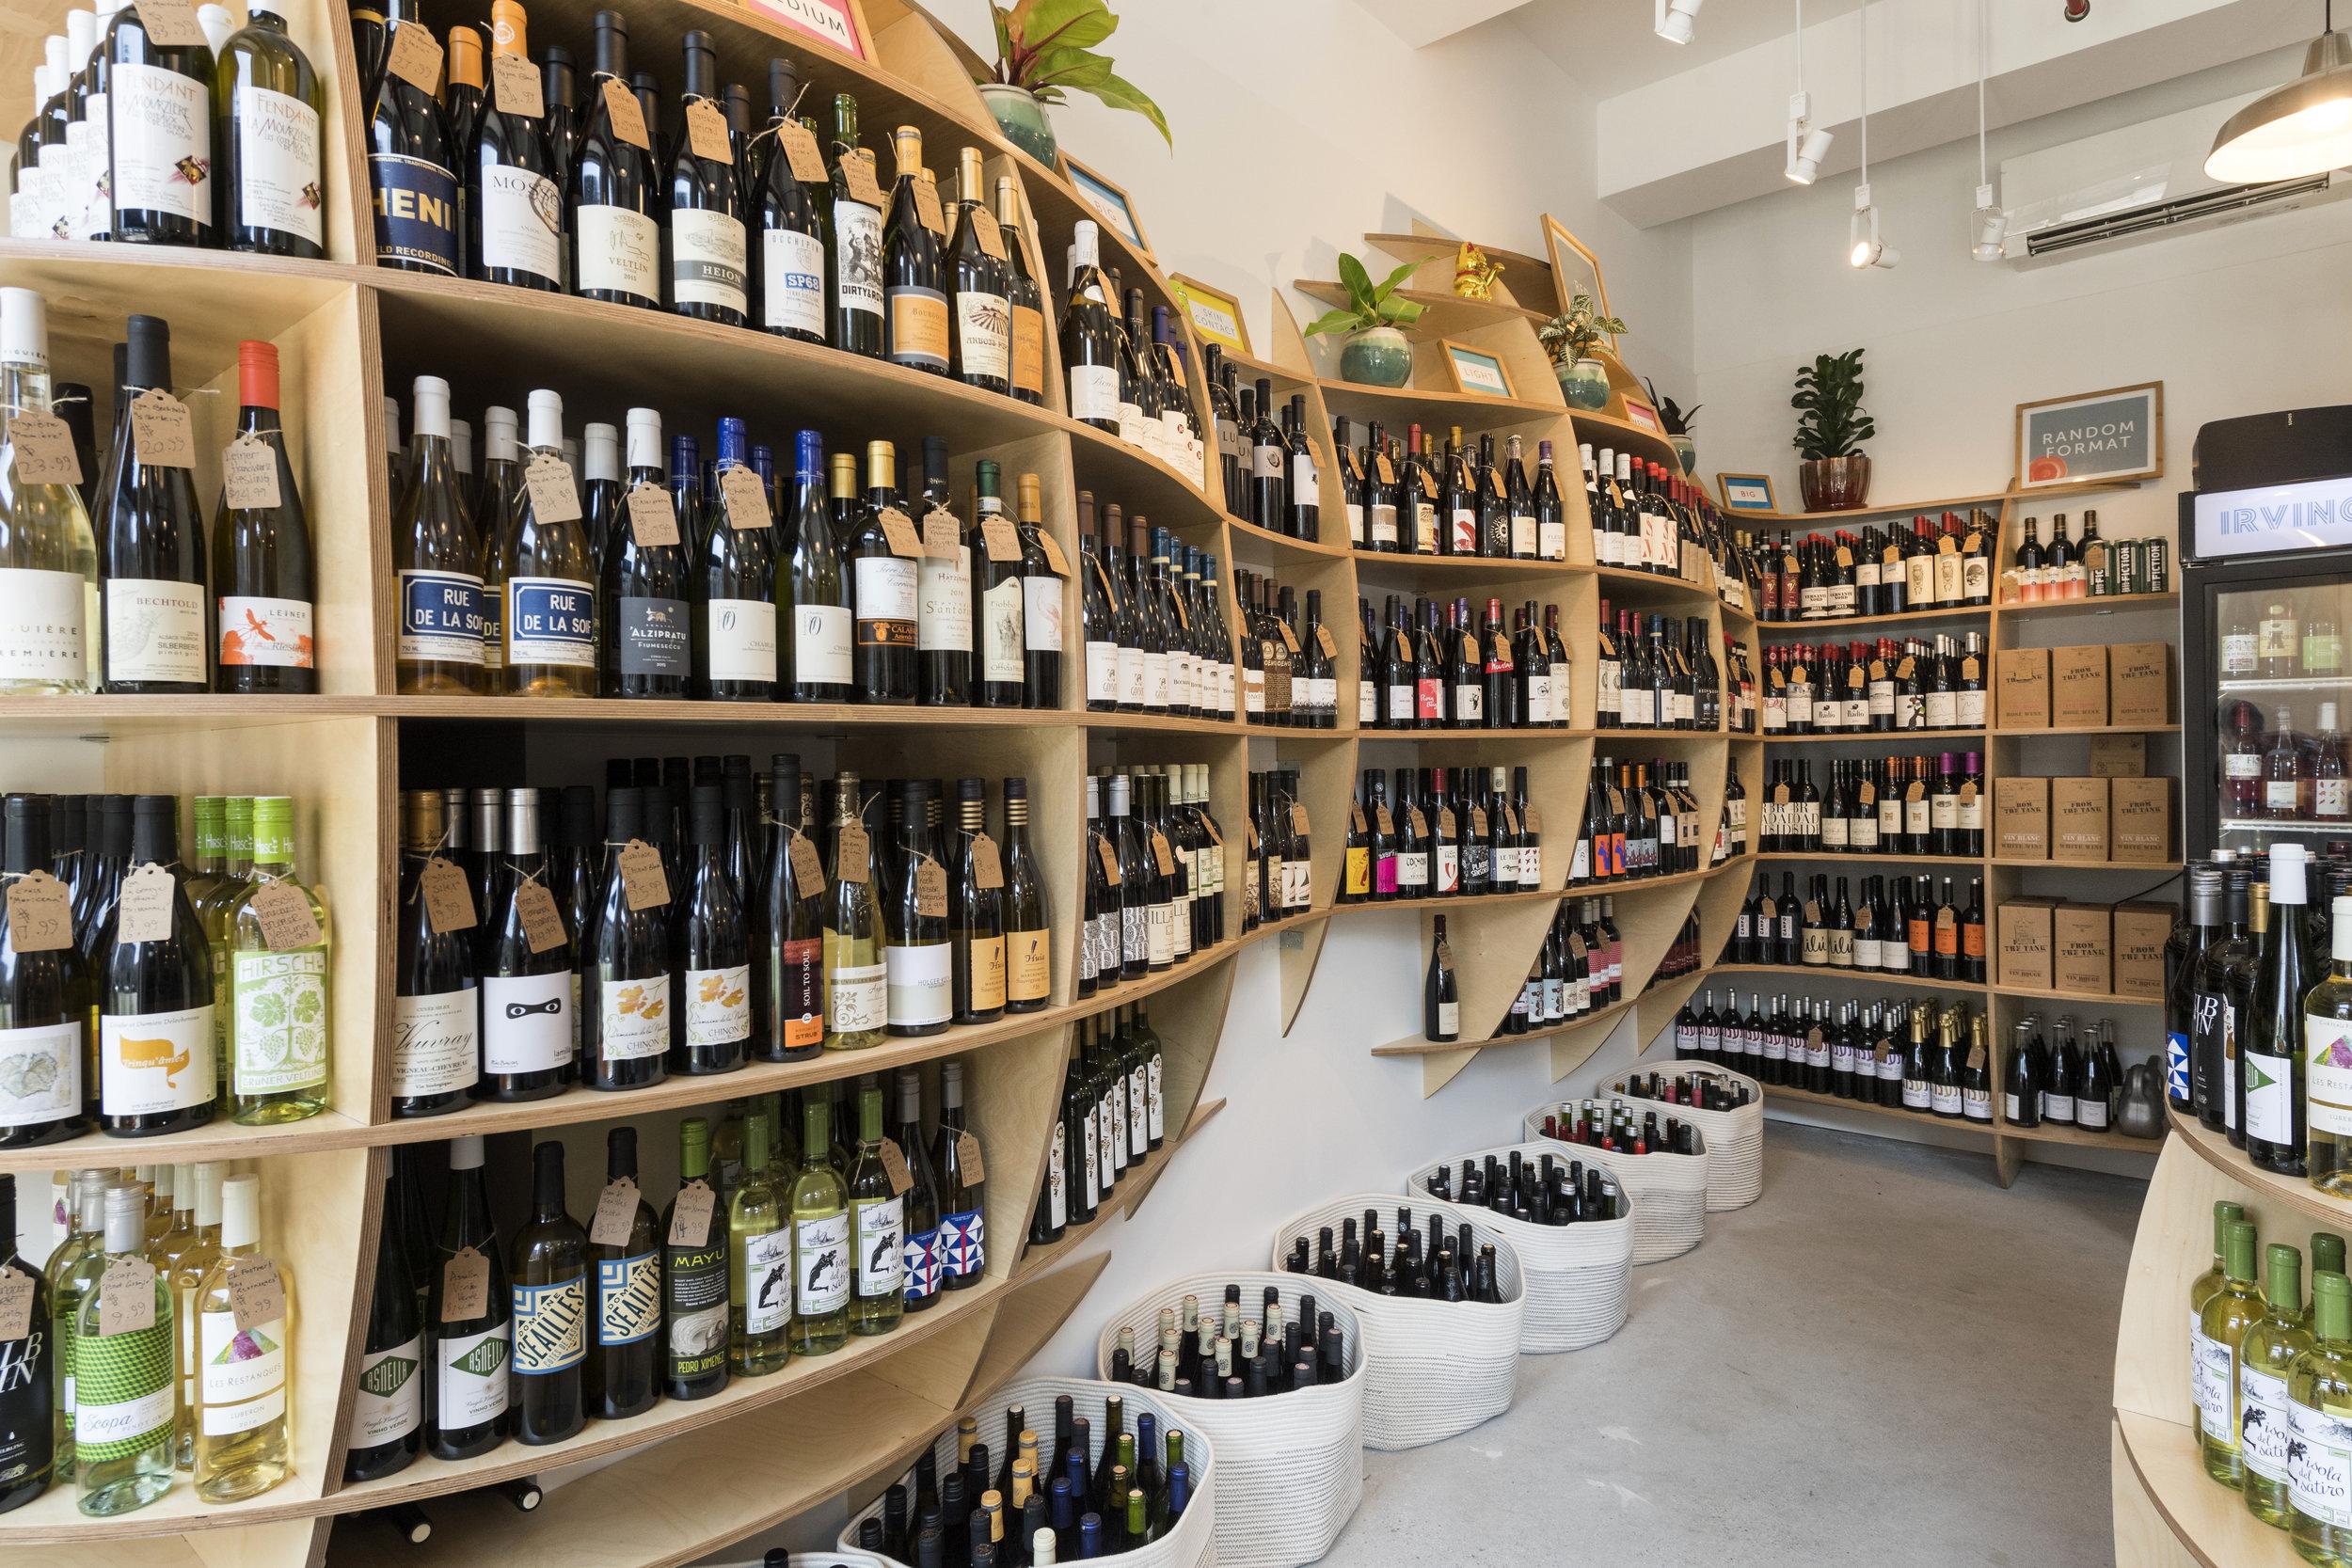 Irving Bottle interior - wine